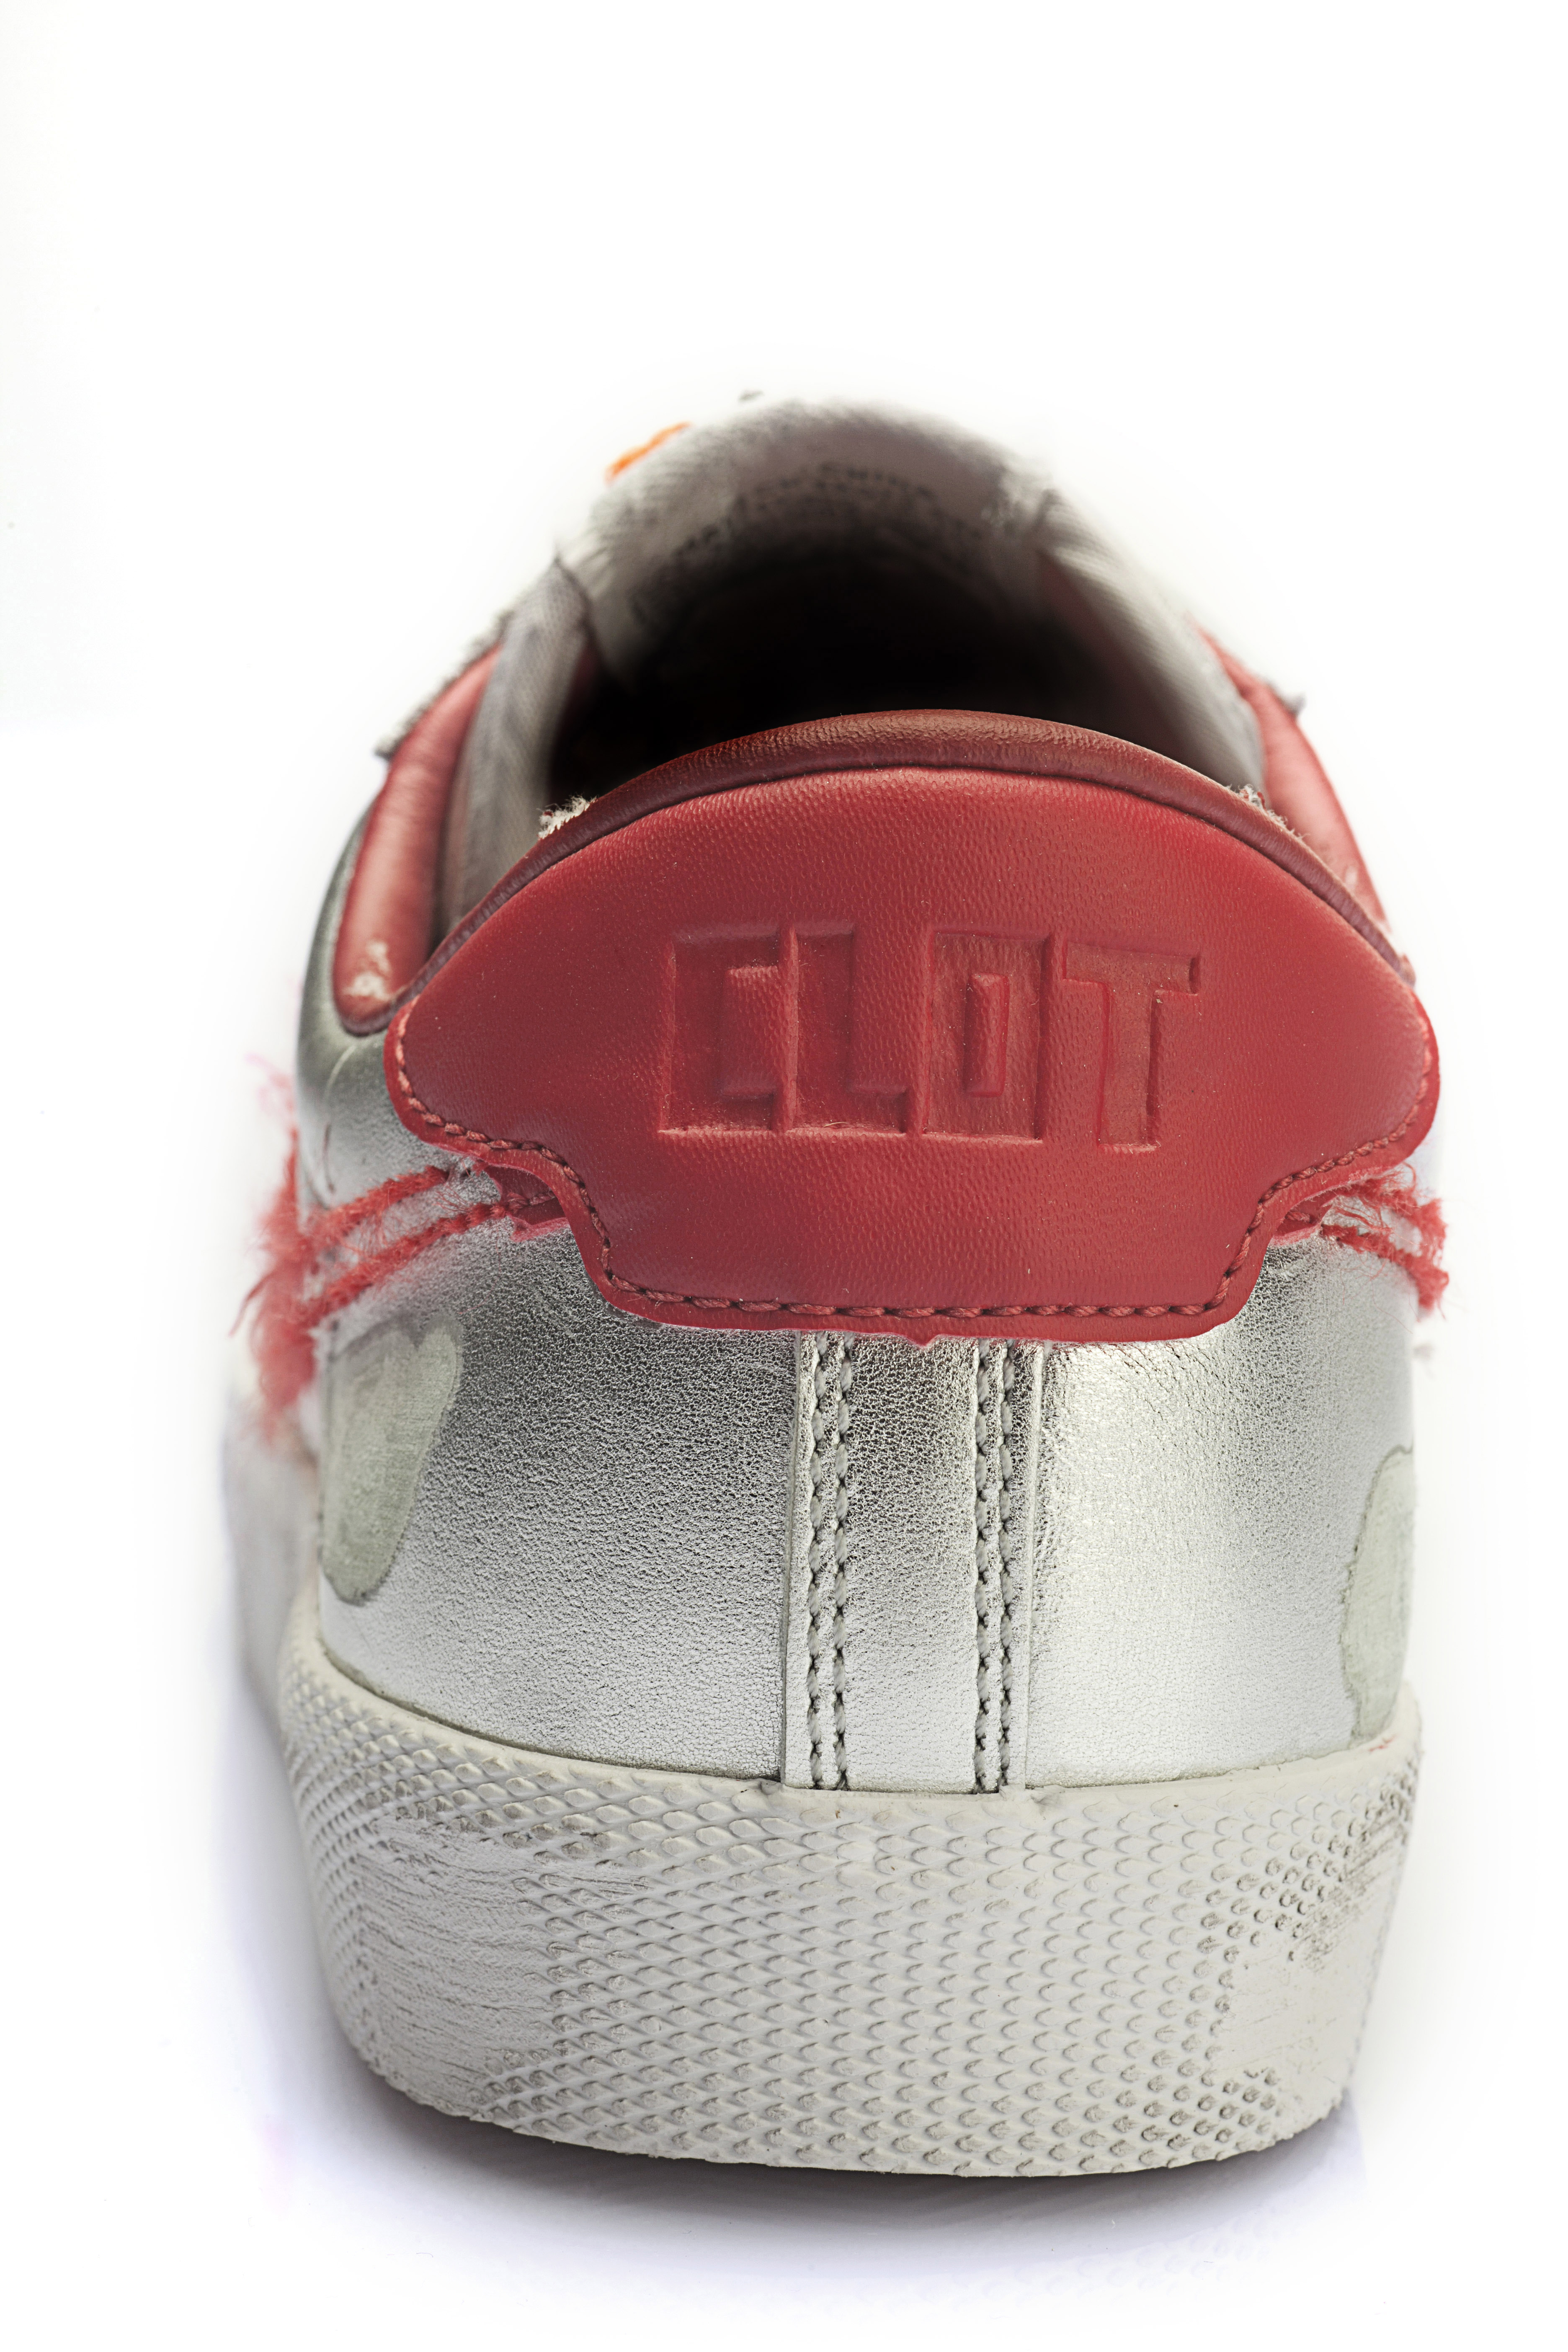 ... NIKE Sportswear x CLOT Tennis Classic. Download Image LO · HI ... b8723d732a53